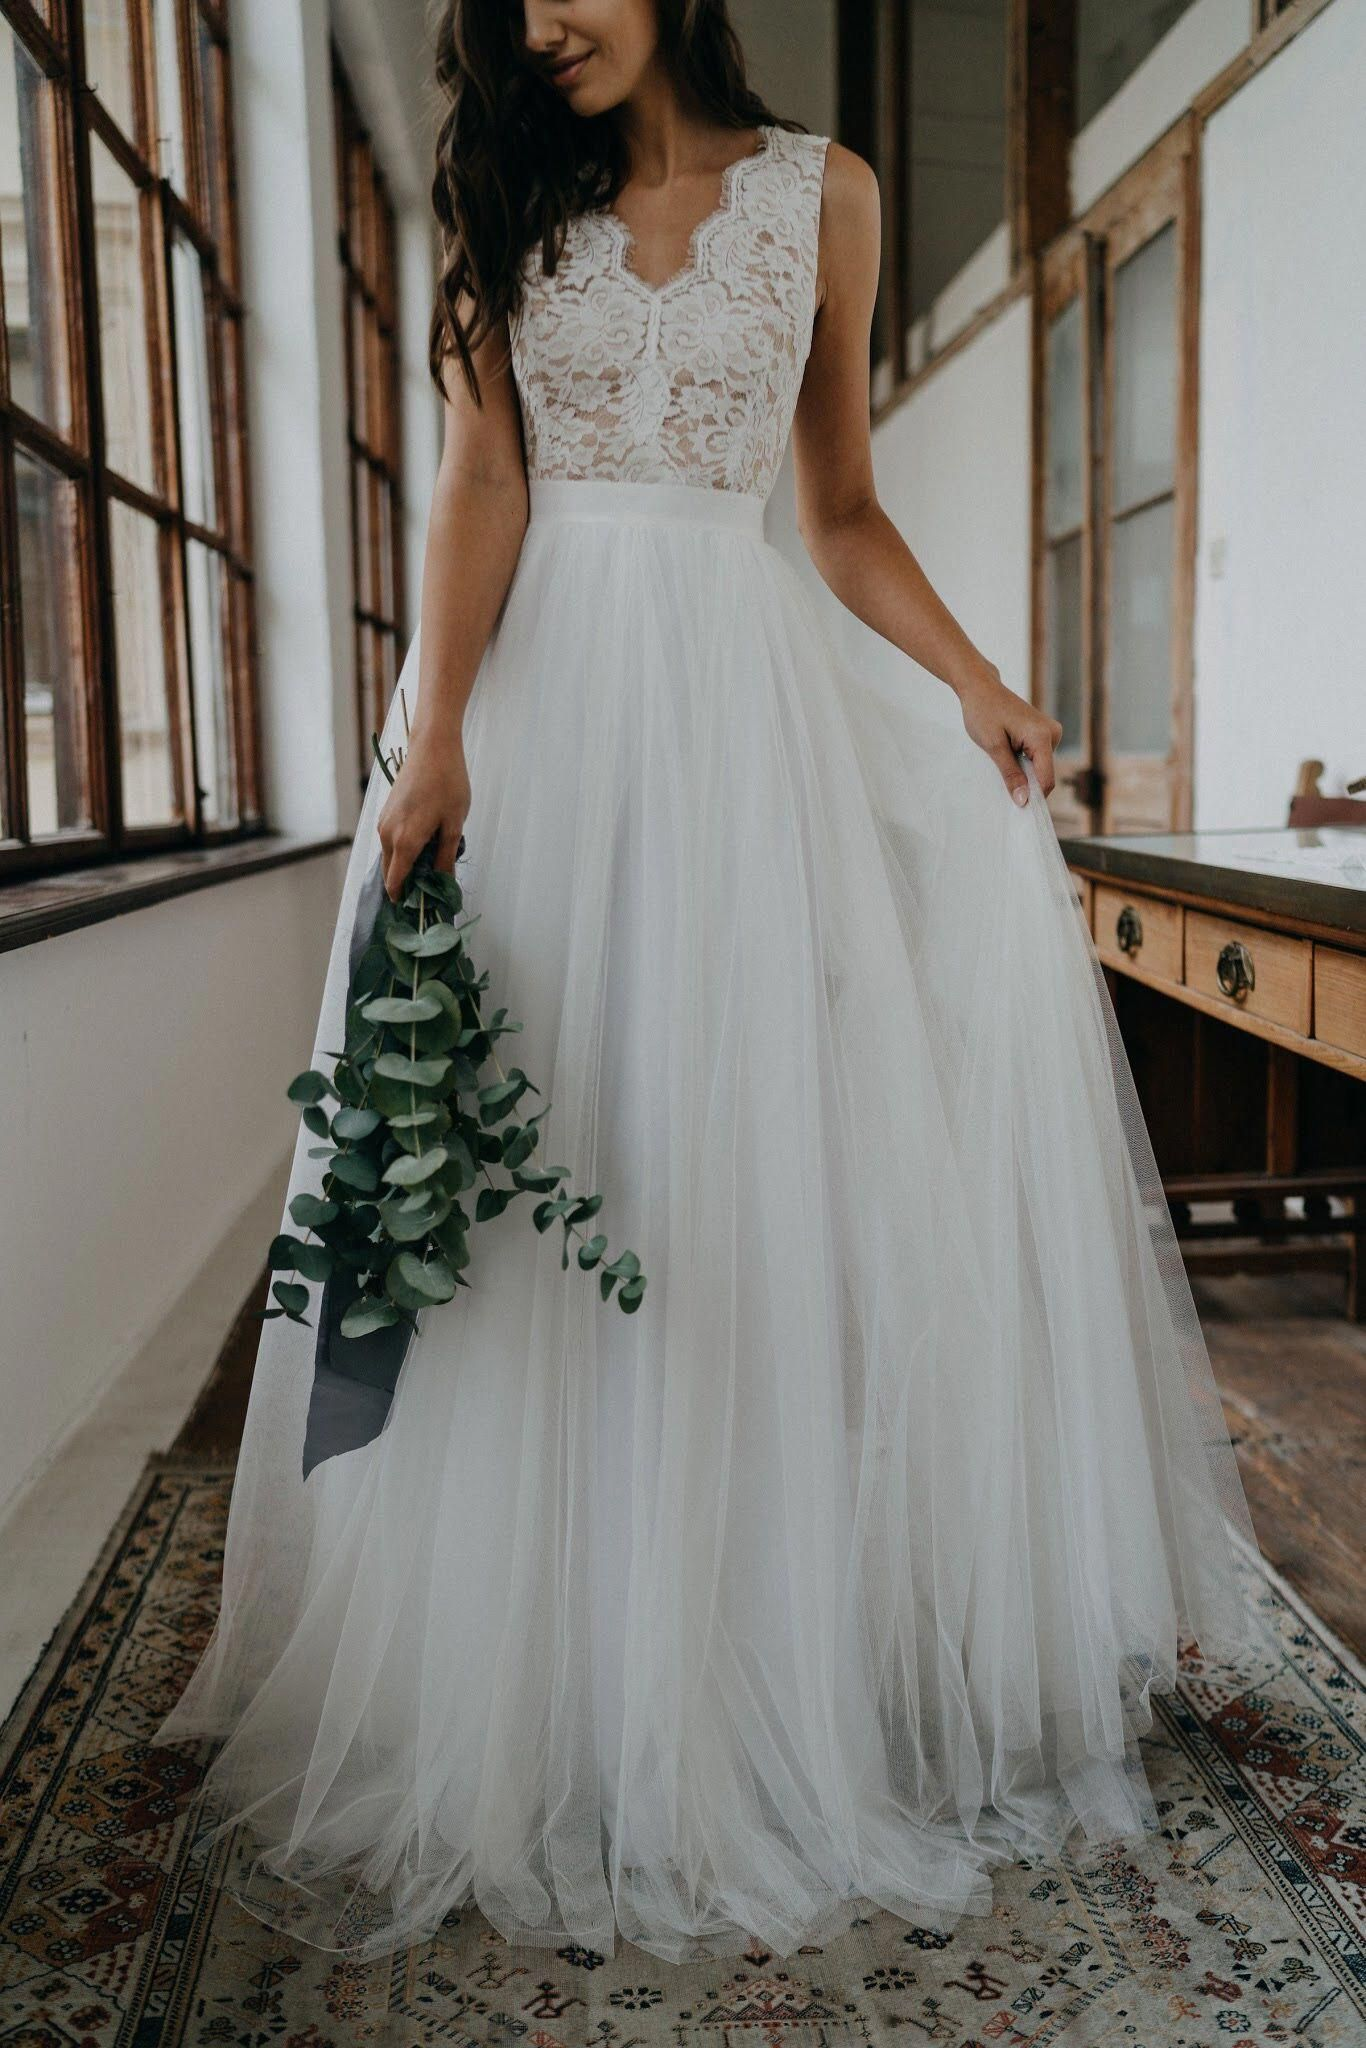 Sell Wedding Dress Knee Length Wedding Dresses Wedding List 20190226 Knee Length Wedding Dress Ball Gowns Wedding A Line Wedding Dress,Princess Aurora Wedding Dress Maleficent 2